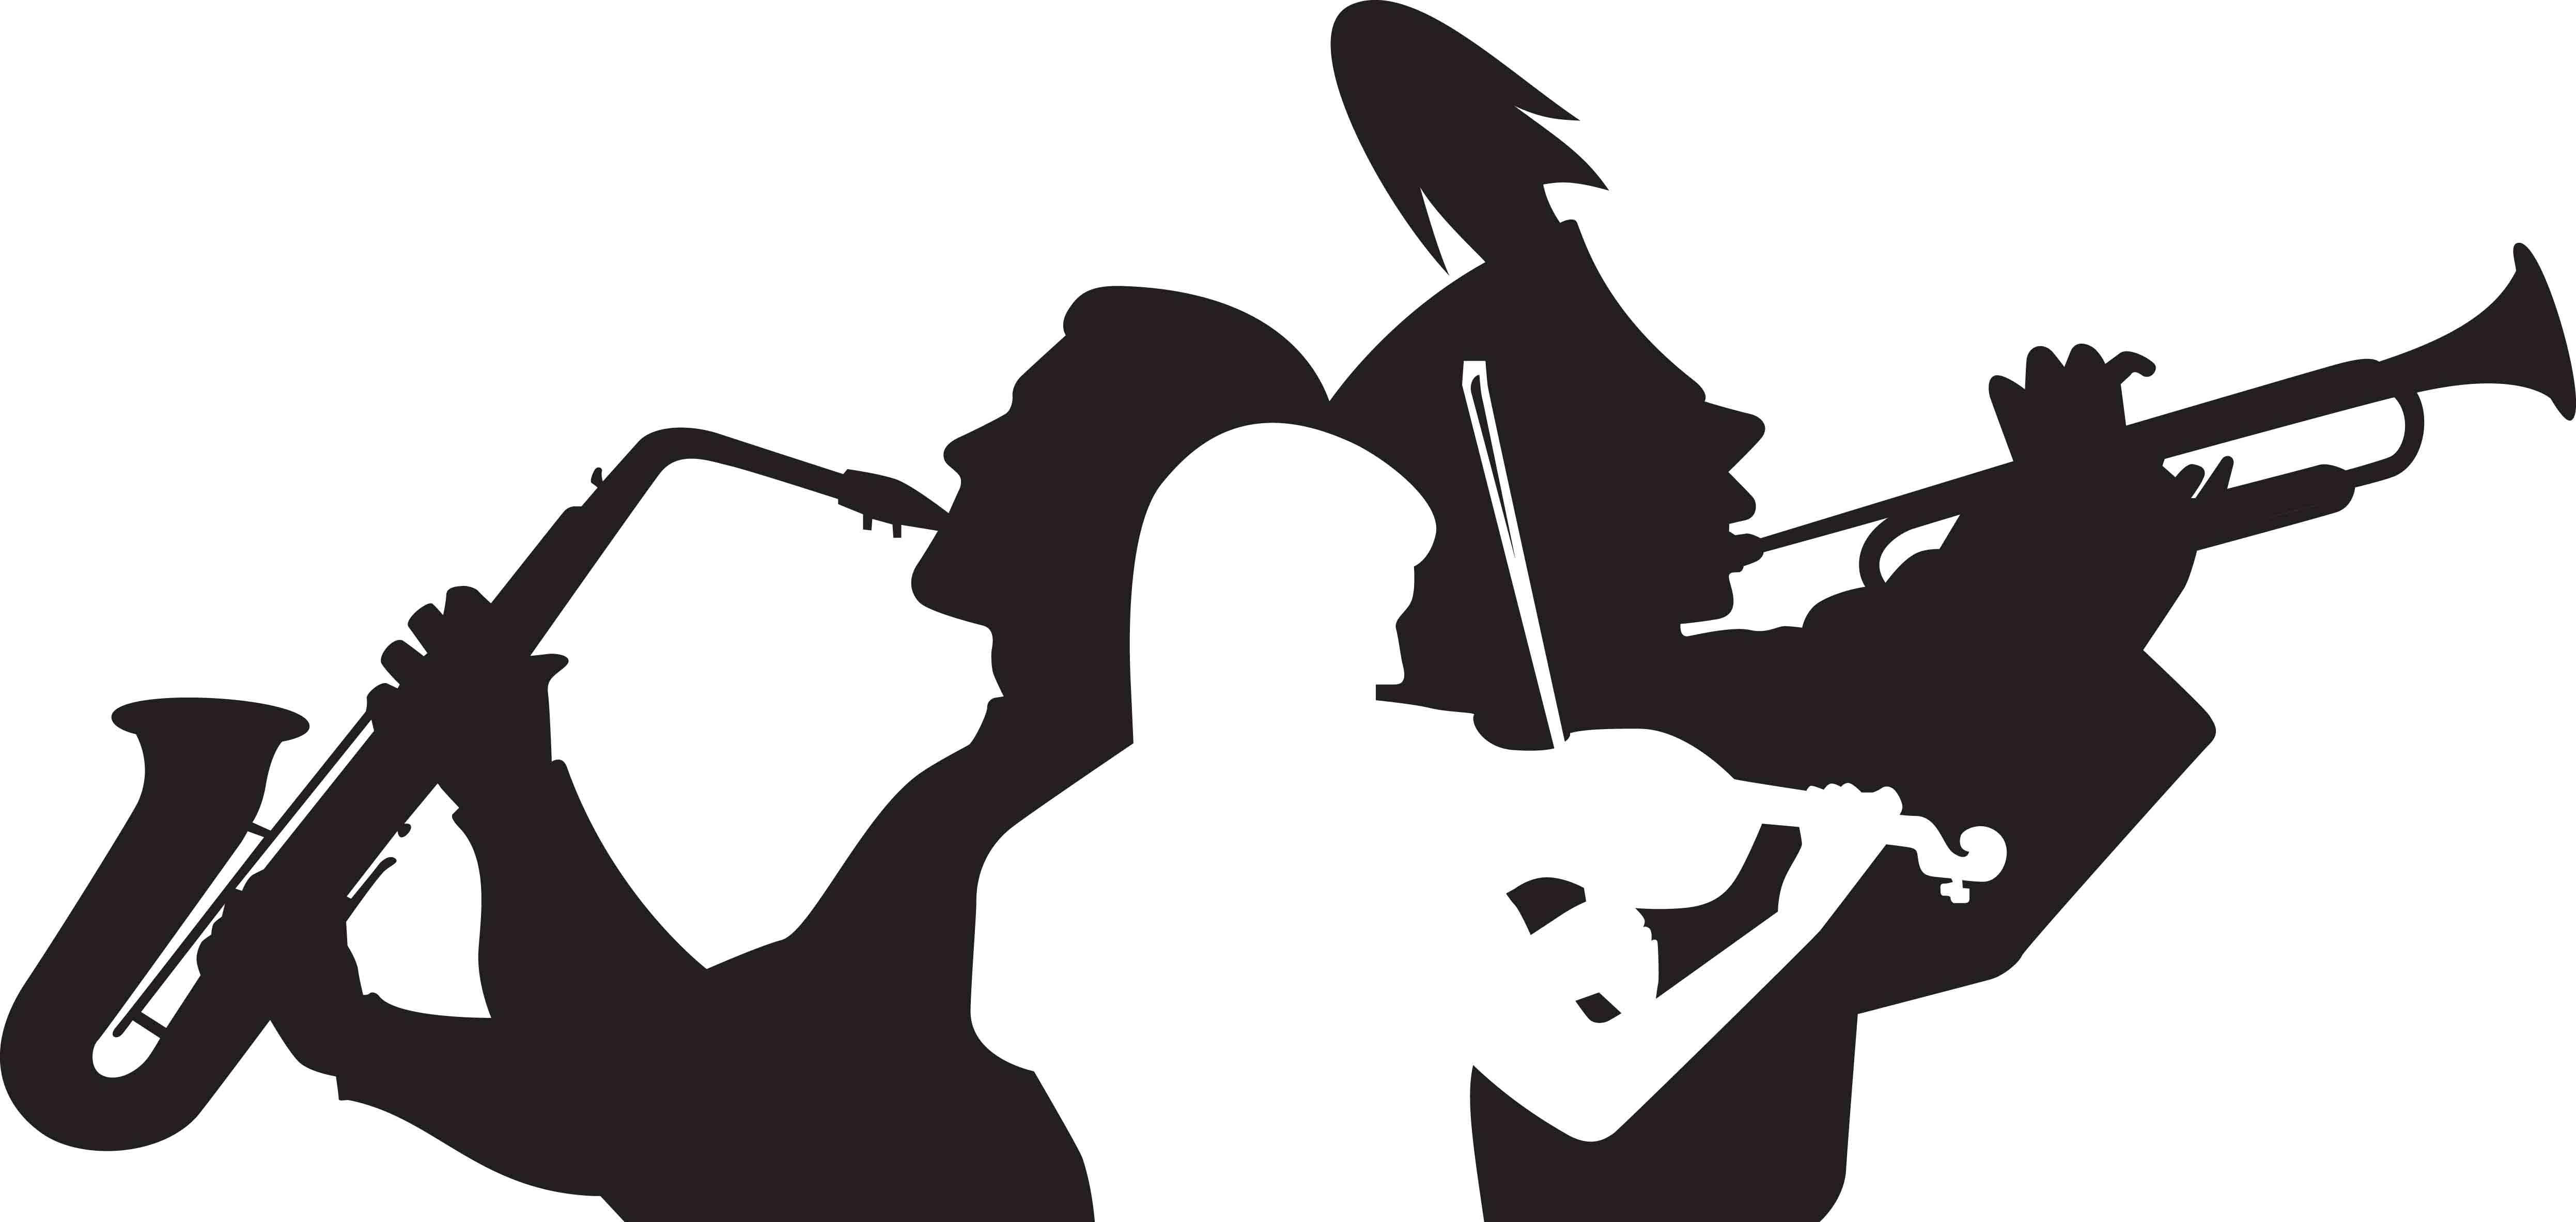 Chorus clipart string orchestra, Chorus string orchestra.